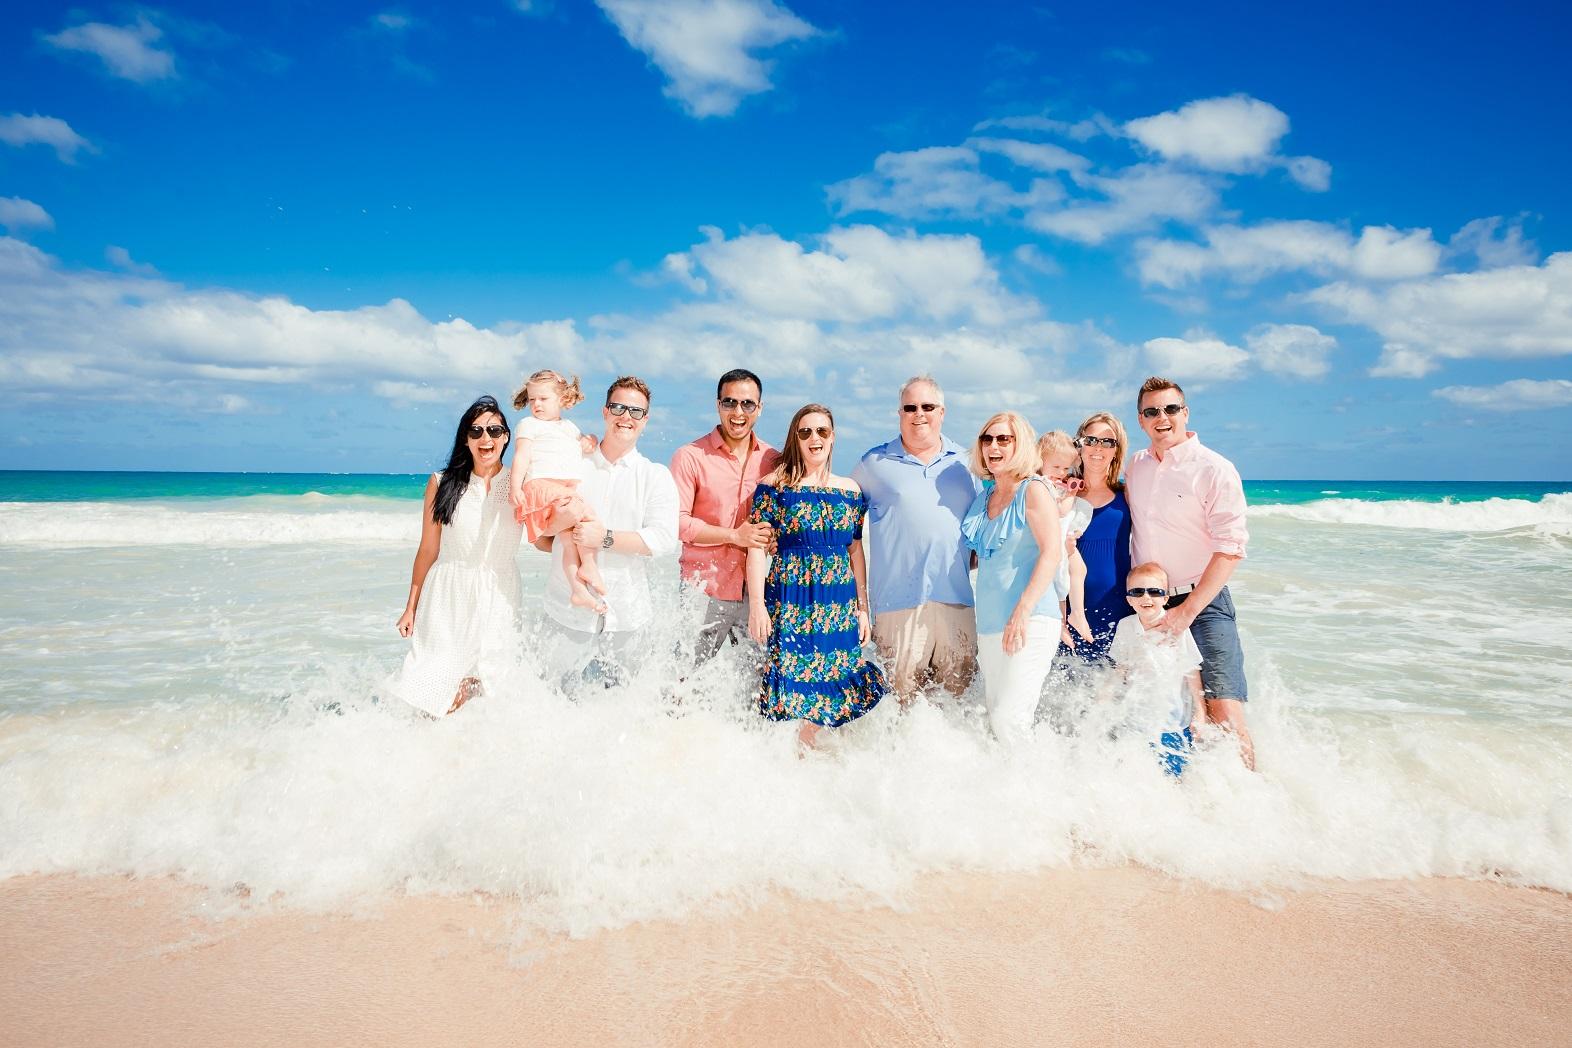 Oahu family vacation ocean beach wave portrait